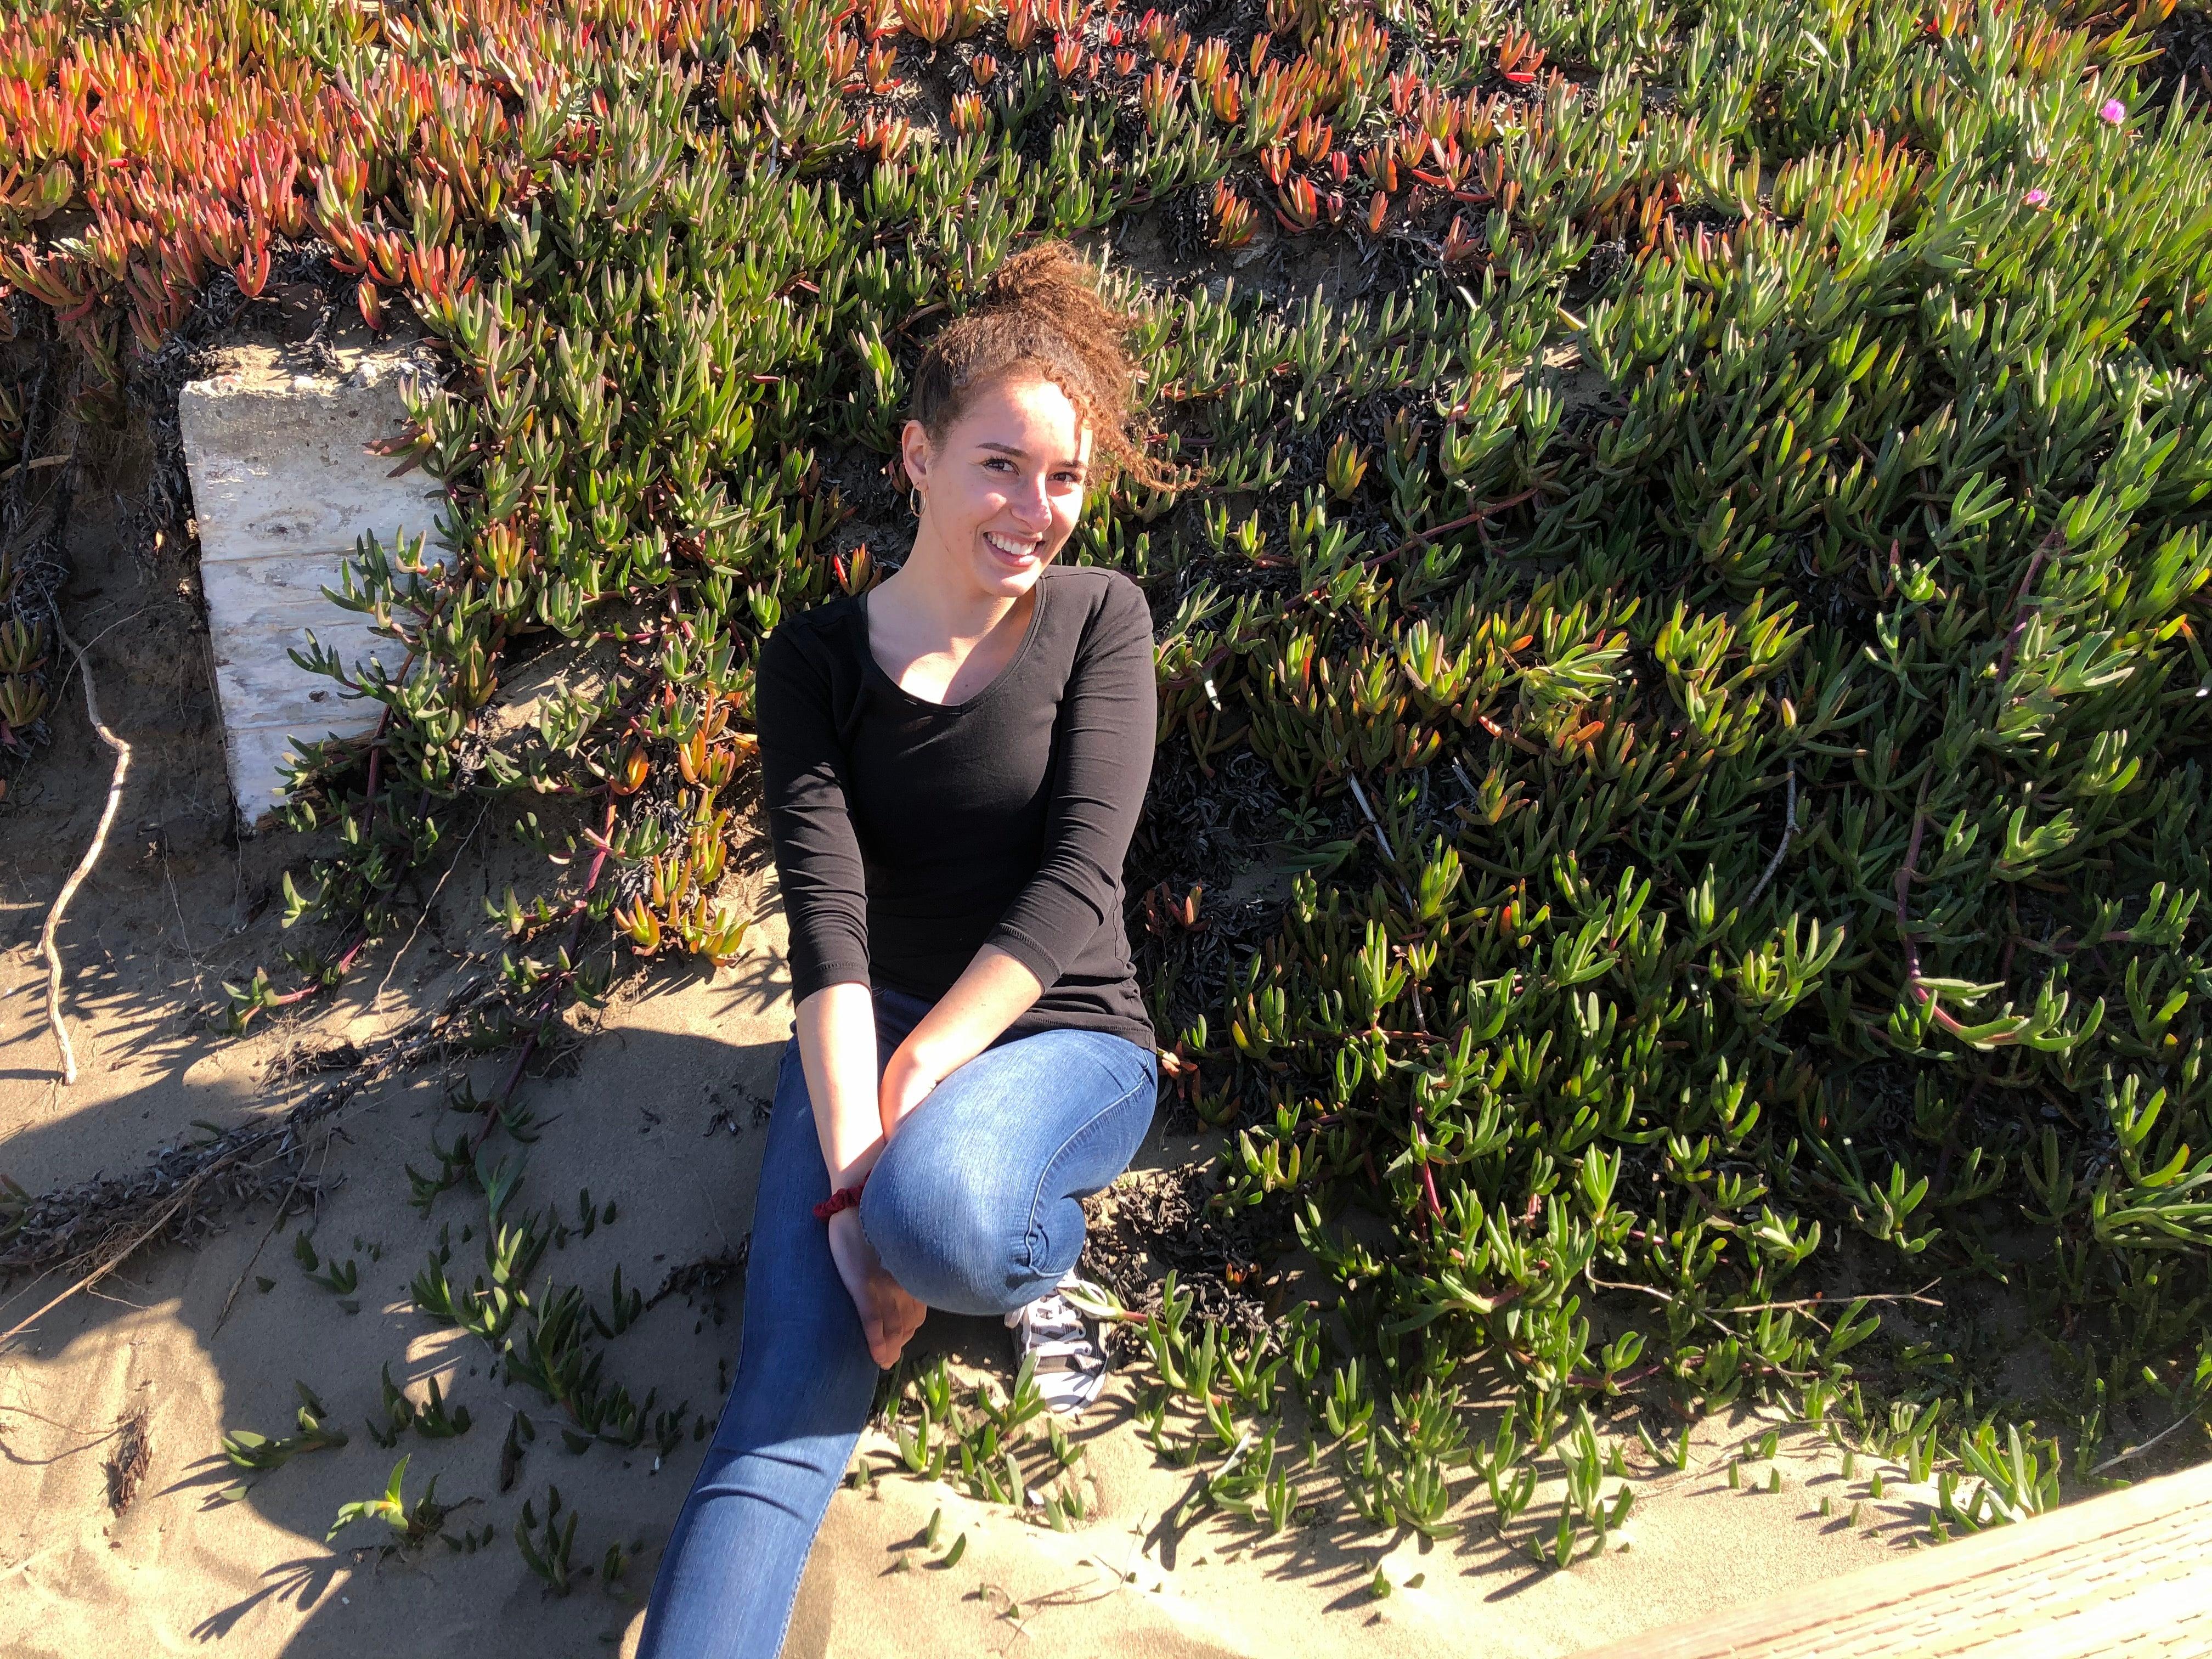 Hanna siting in garden